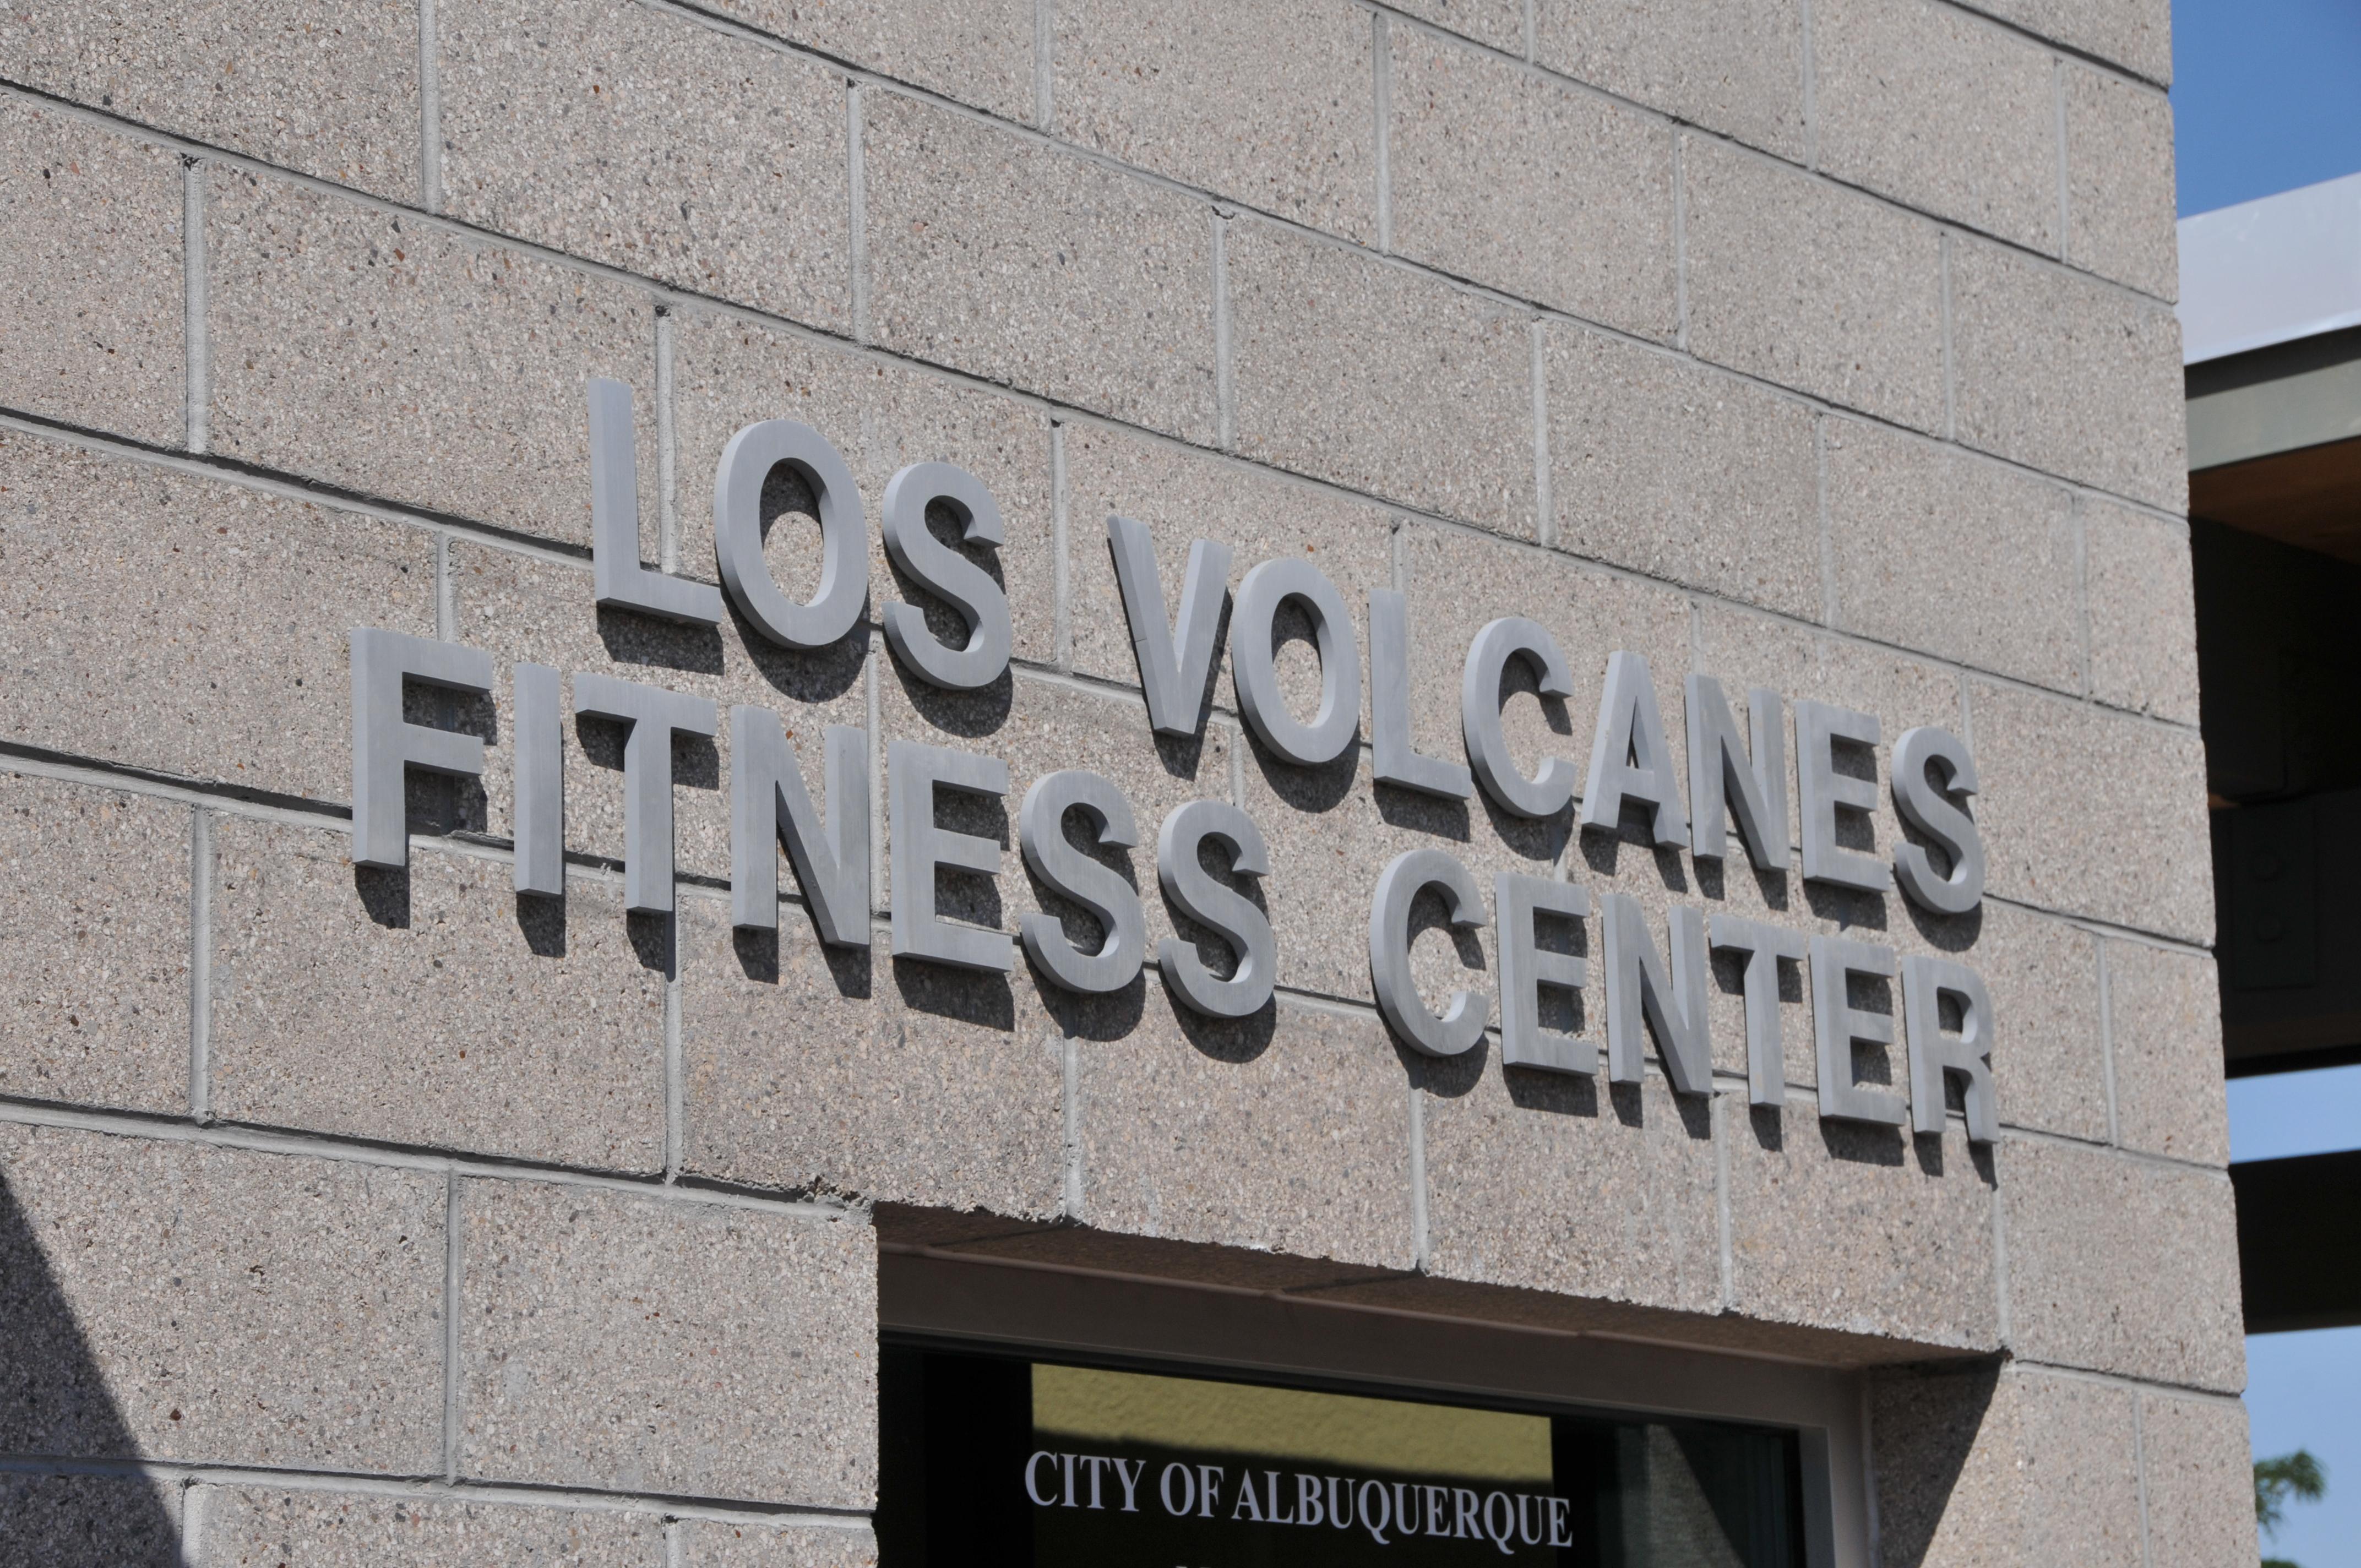 Los Volcanes Fitness Center Sign